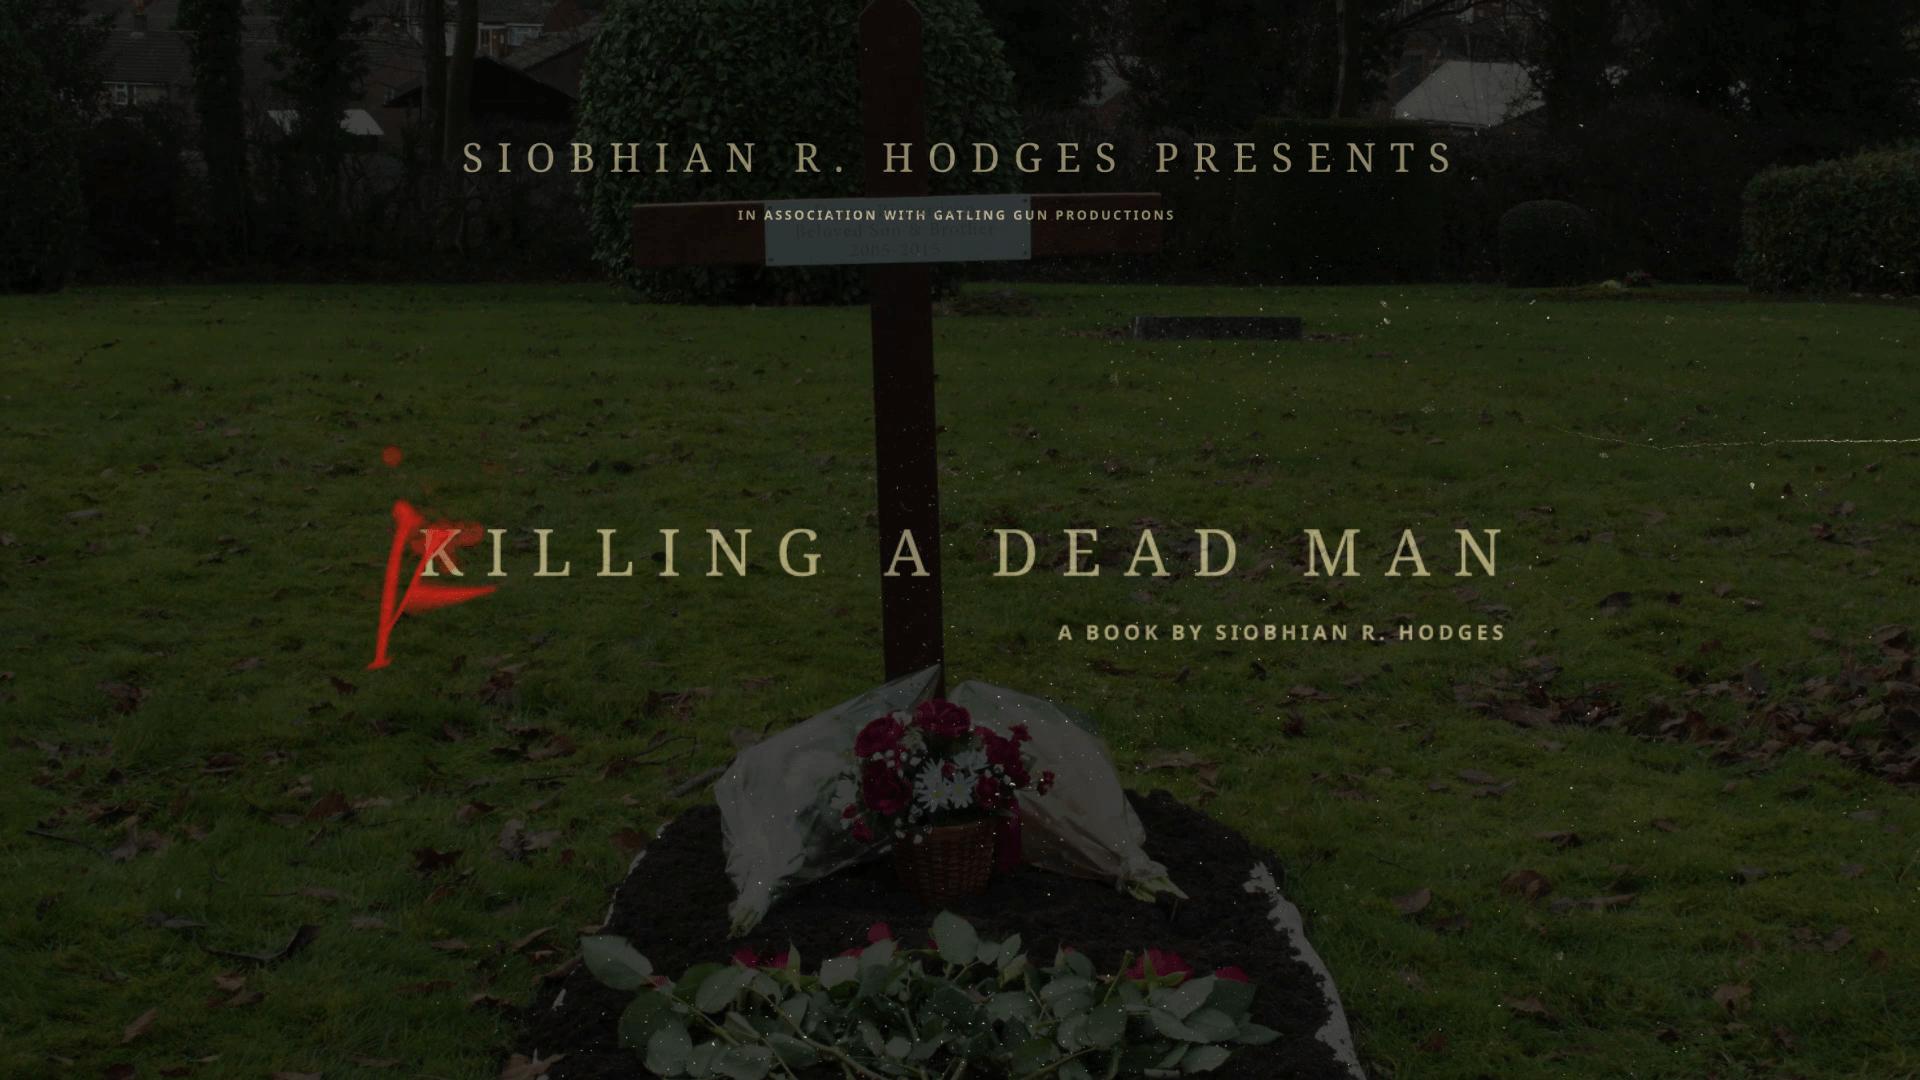 Killing a Dead Man Book Trailer - Siobhian R. Hodges Author